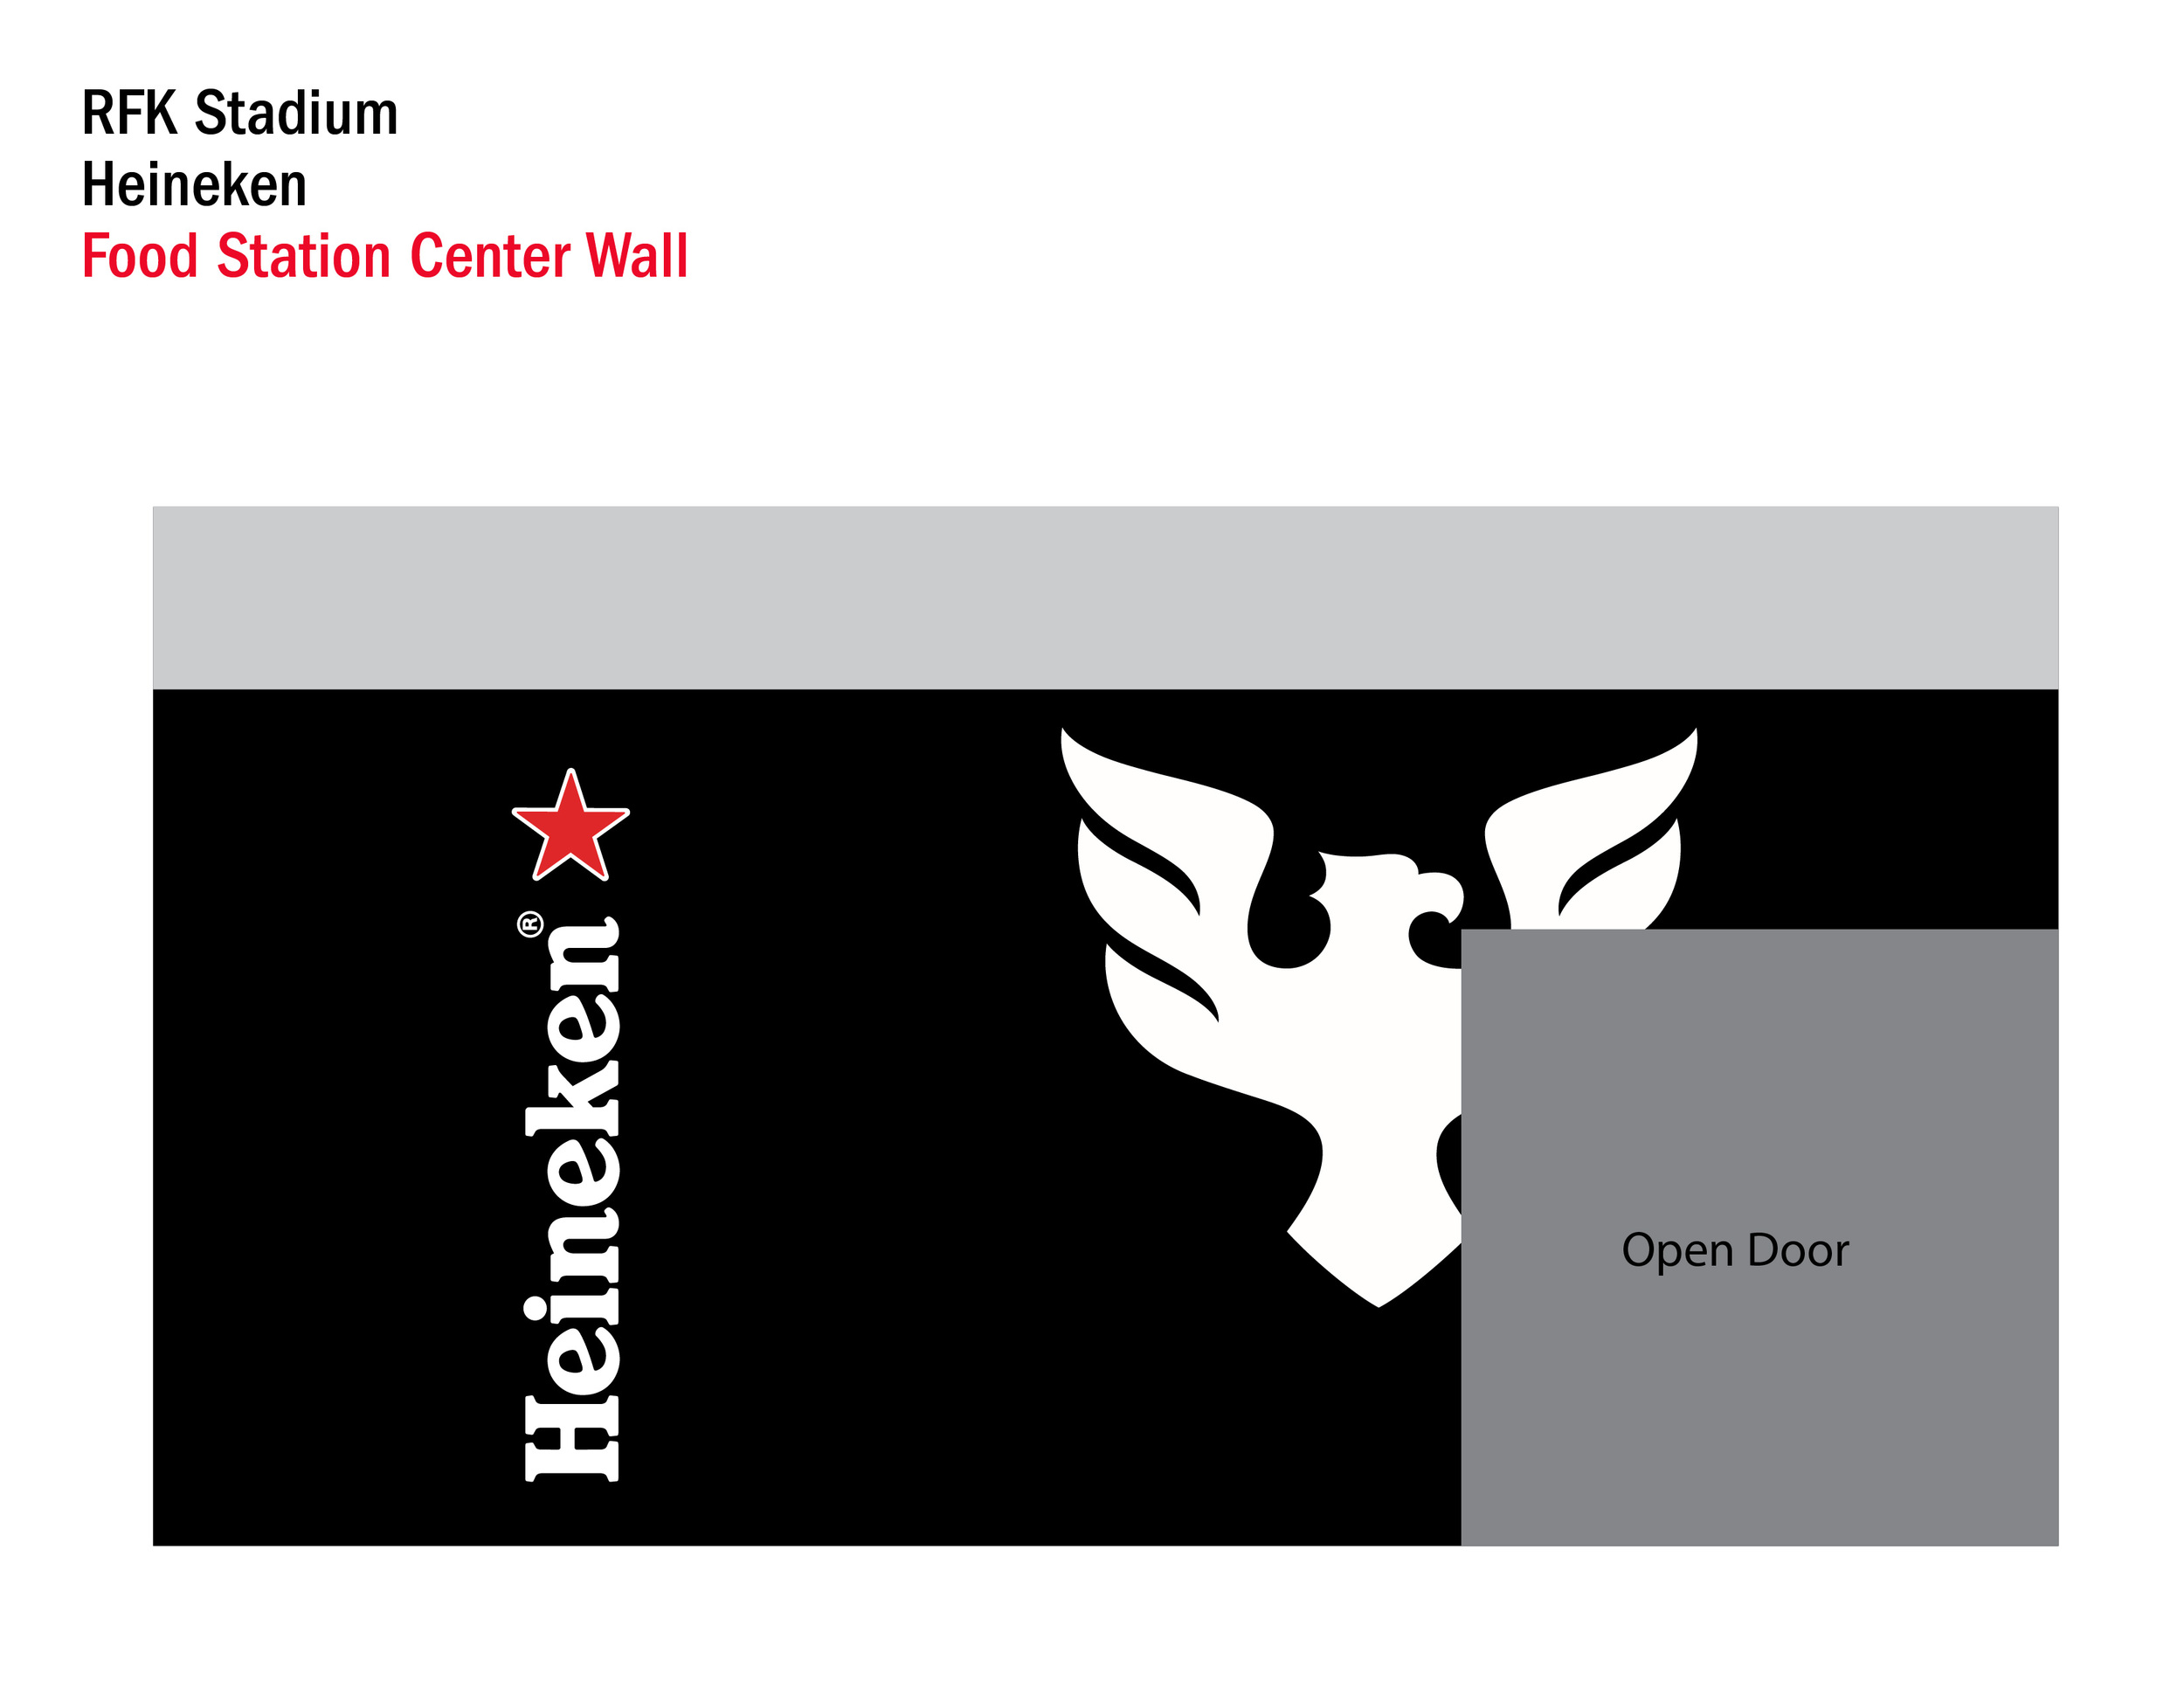 Heineken_RFKStadium_BlackWall-Withopening_2016_V1-01.jpg